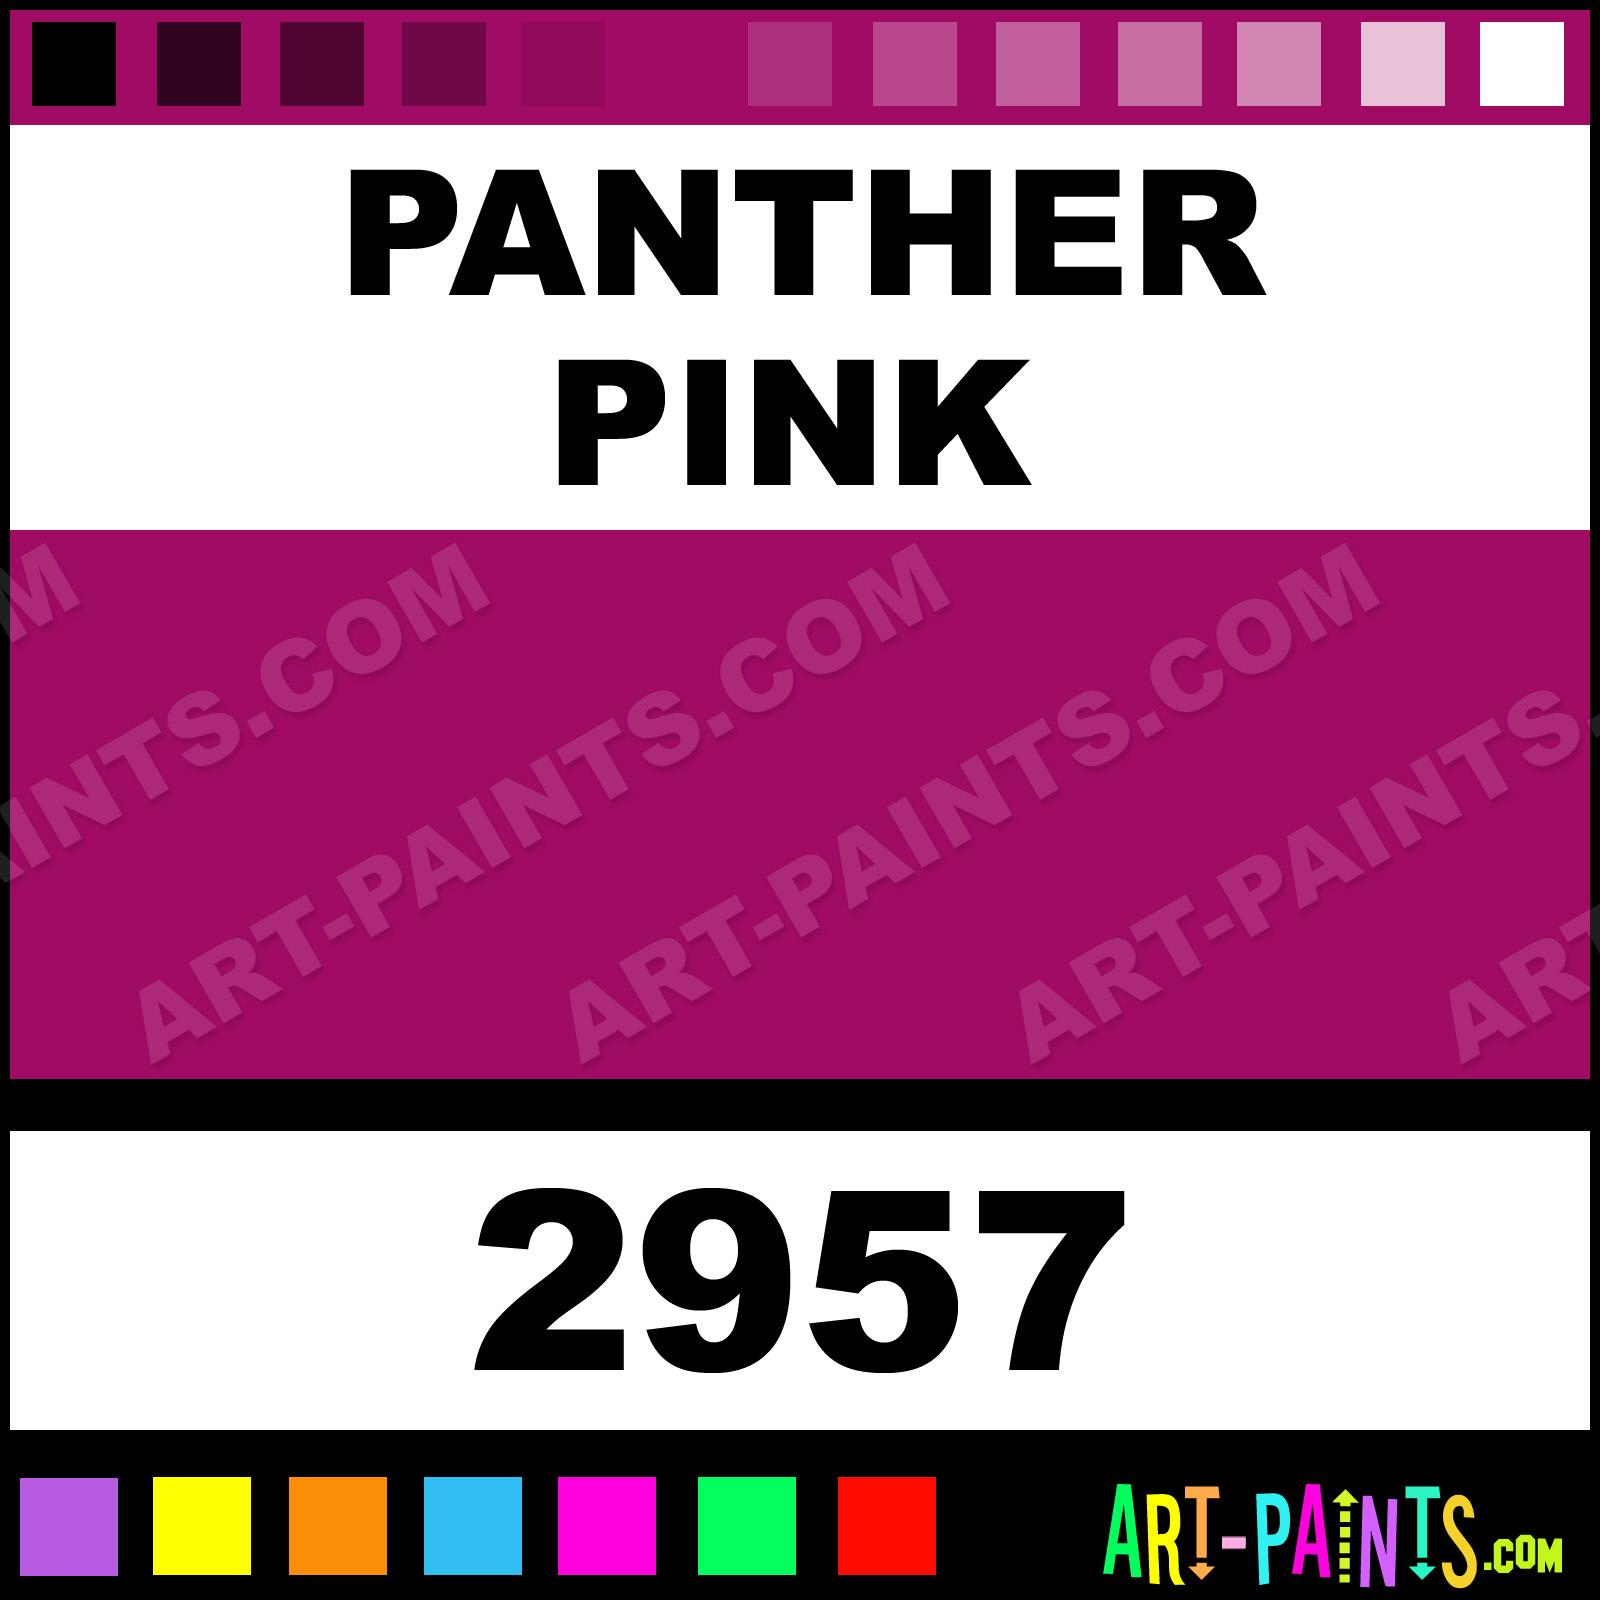 Car paint color samples - Paint Panther Pink Color Model Master Car And Truck Enamel Aerosol